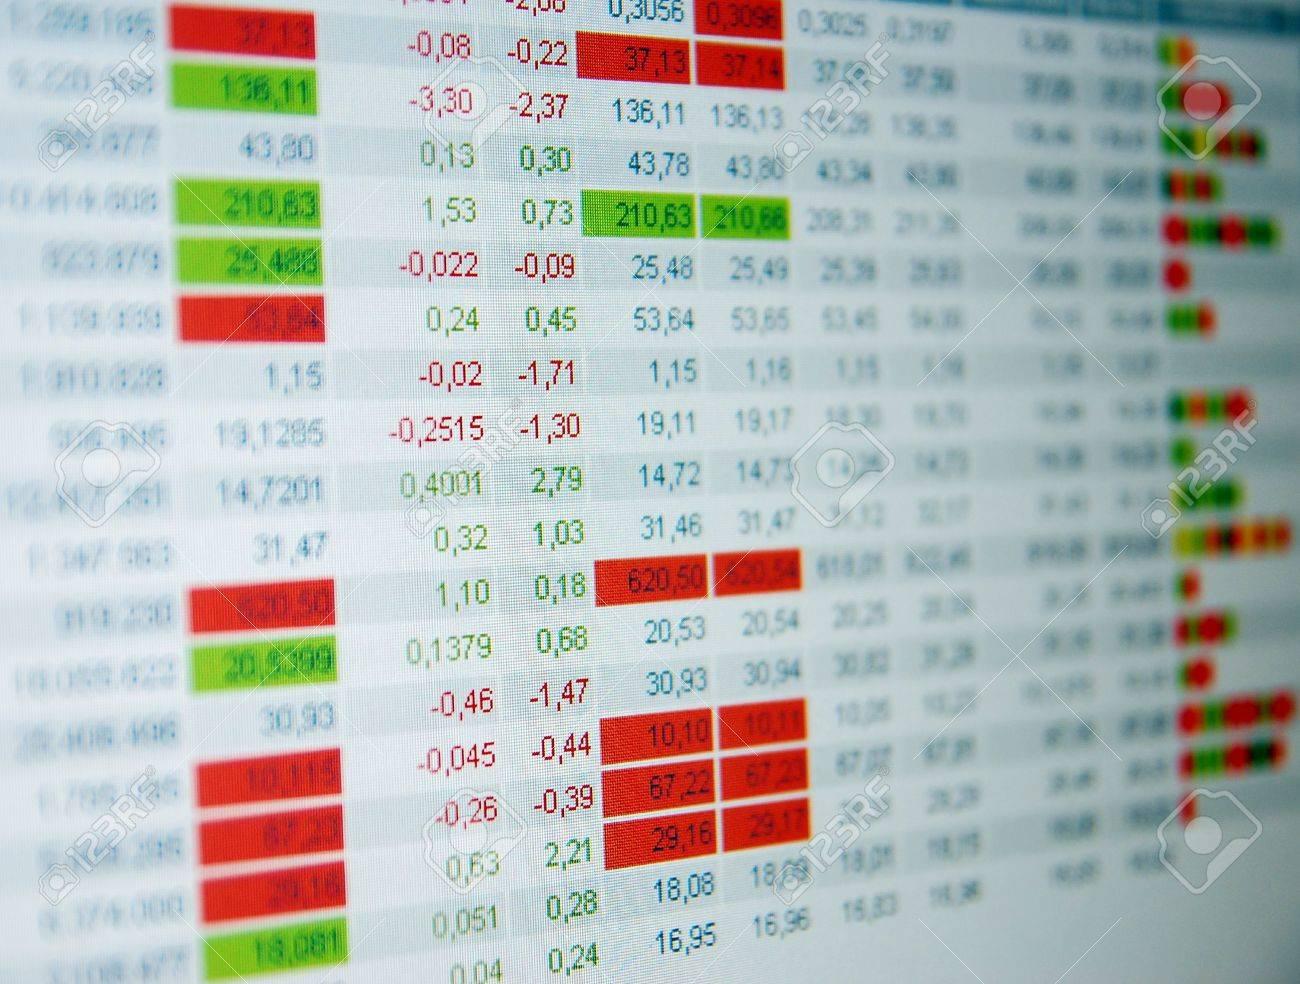 Real Time Stock Quote Real Time Stock Quotes Extraordinary Wallalaf Real Time Stock